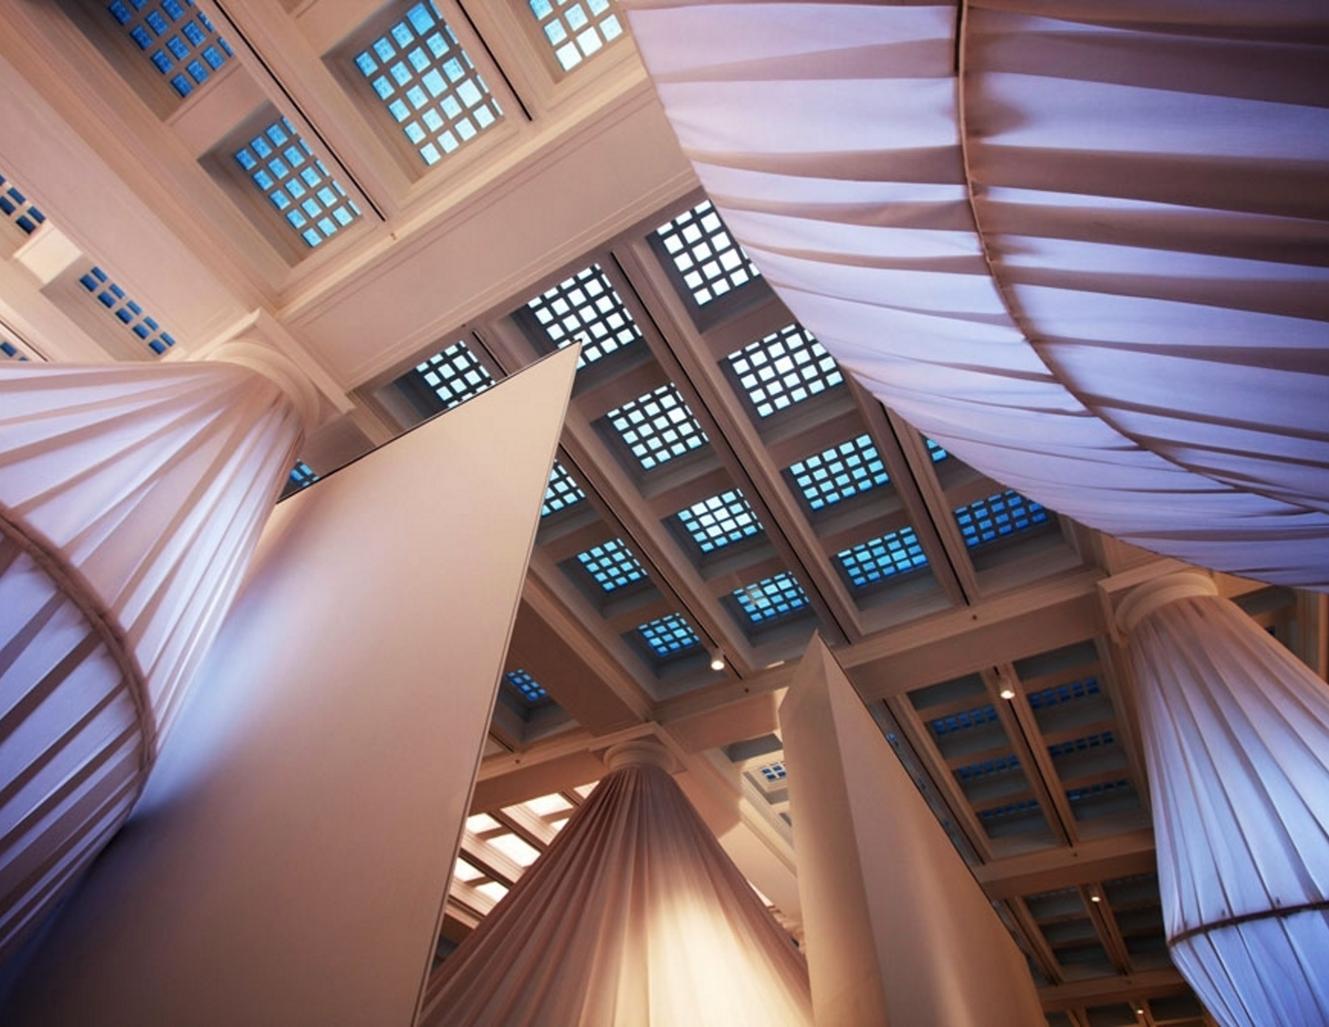 Shot looking up at reOrder art installation at the Brooklyn Museum featuring Sunbrella fabrics